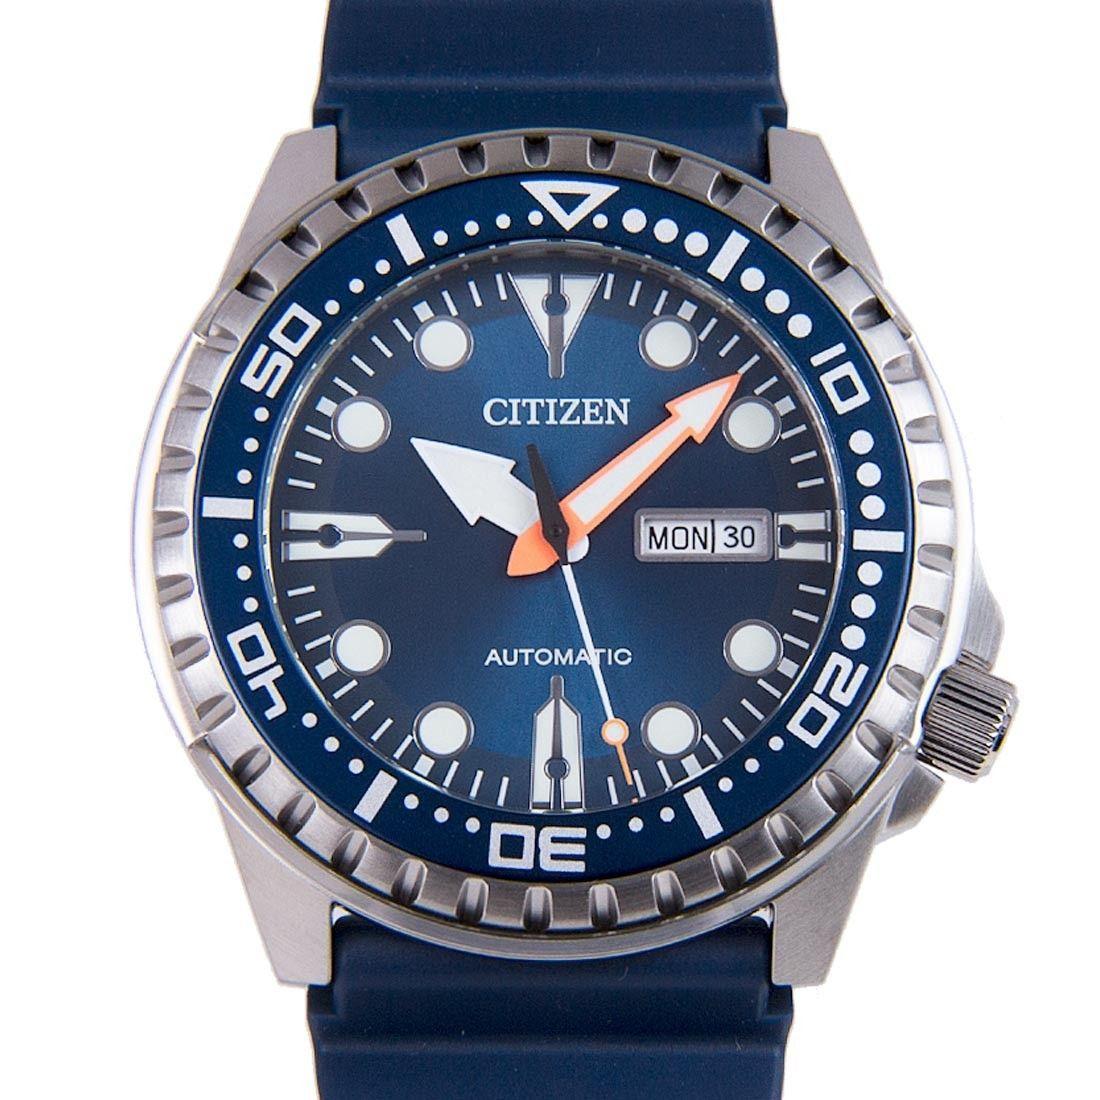 Citizen Automatic Blue Rubber Bracelet Day Date Male